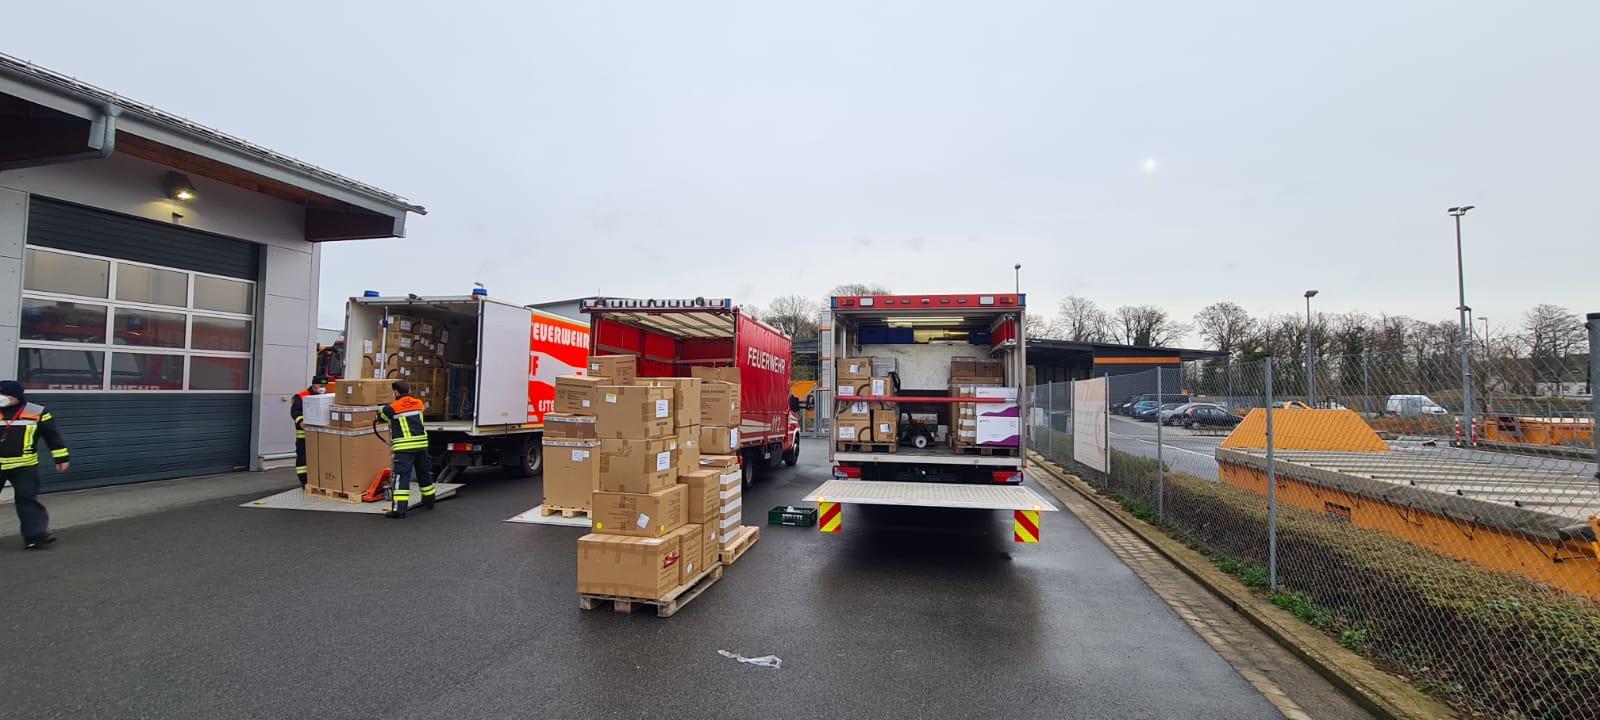 Beladen der Logistikfahrzeuge im Feuerwehrzentrum Klingholz